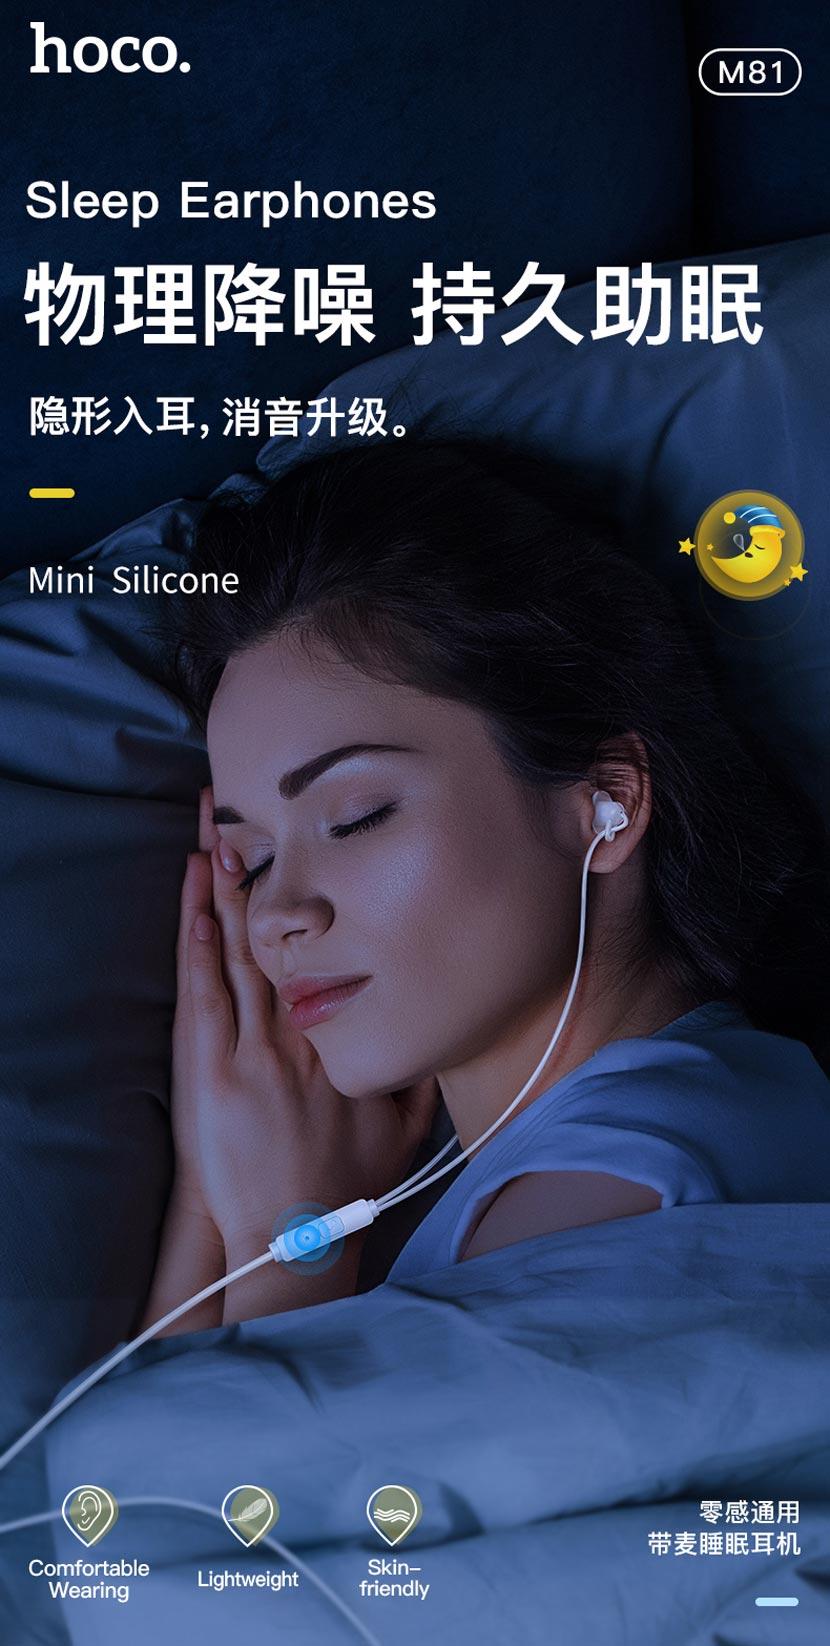 hoco news m81 imperceptible sleeping earphones with mic cn